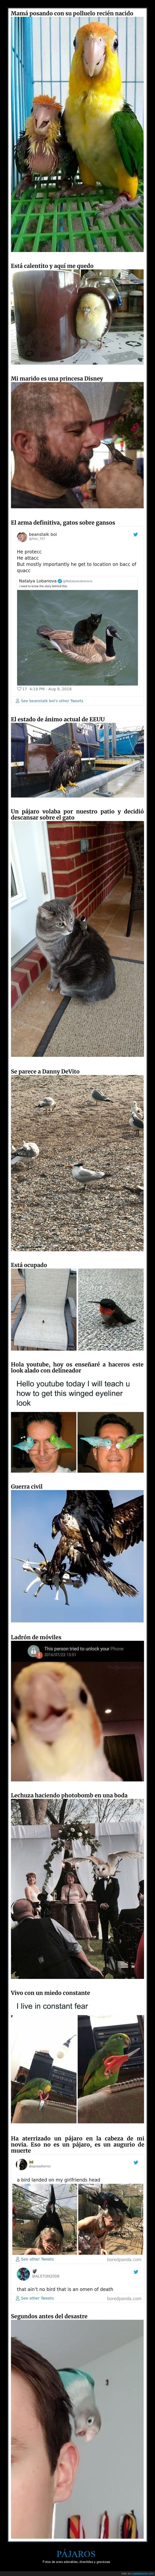 aves,pájaros,wtf